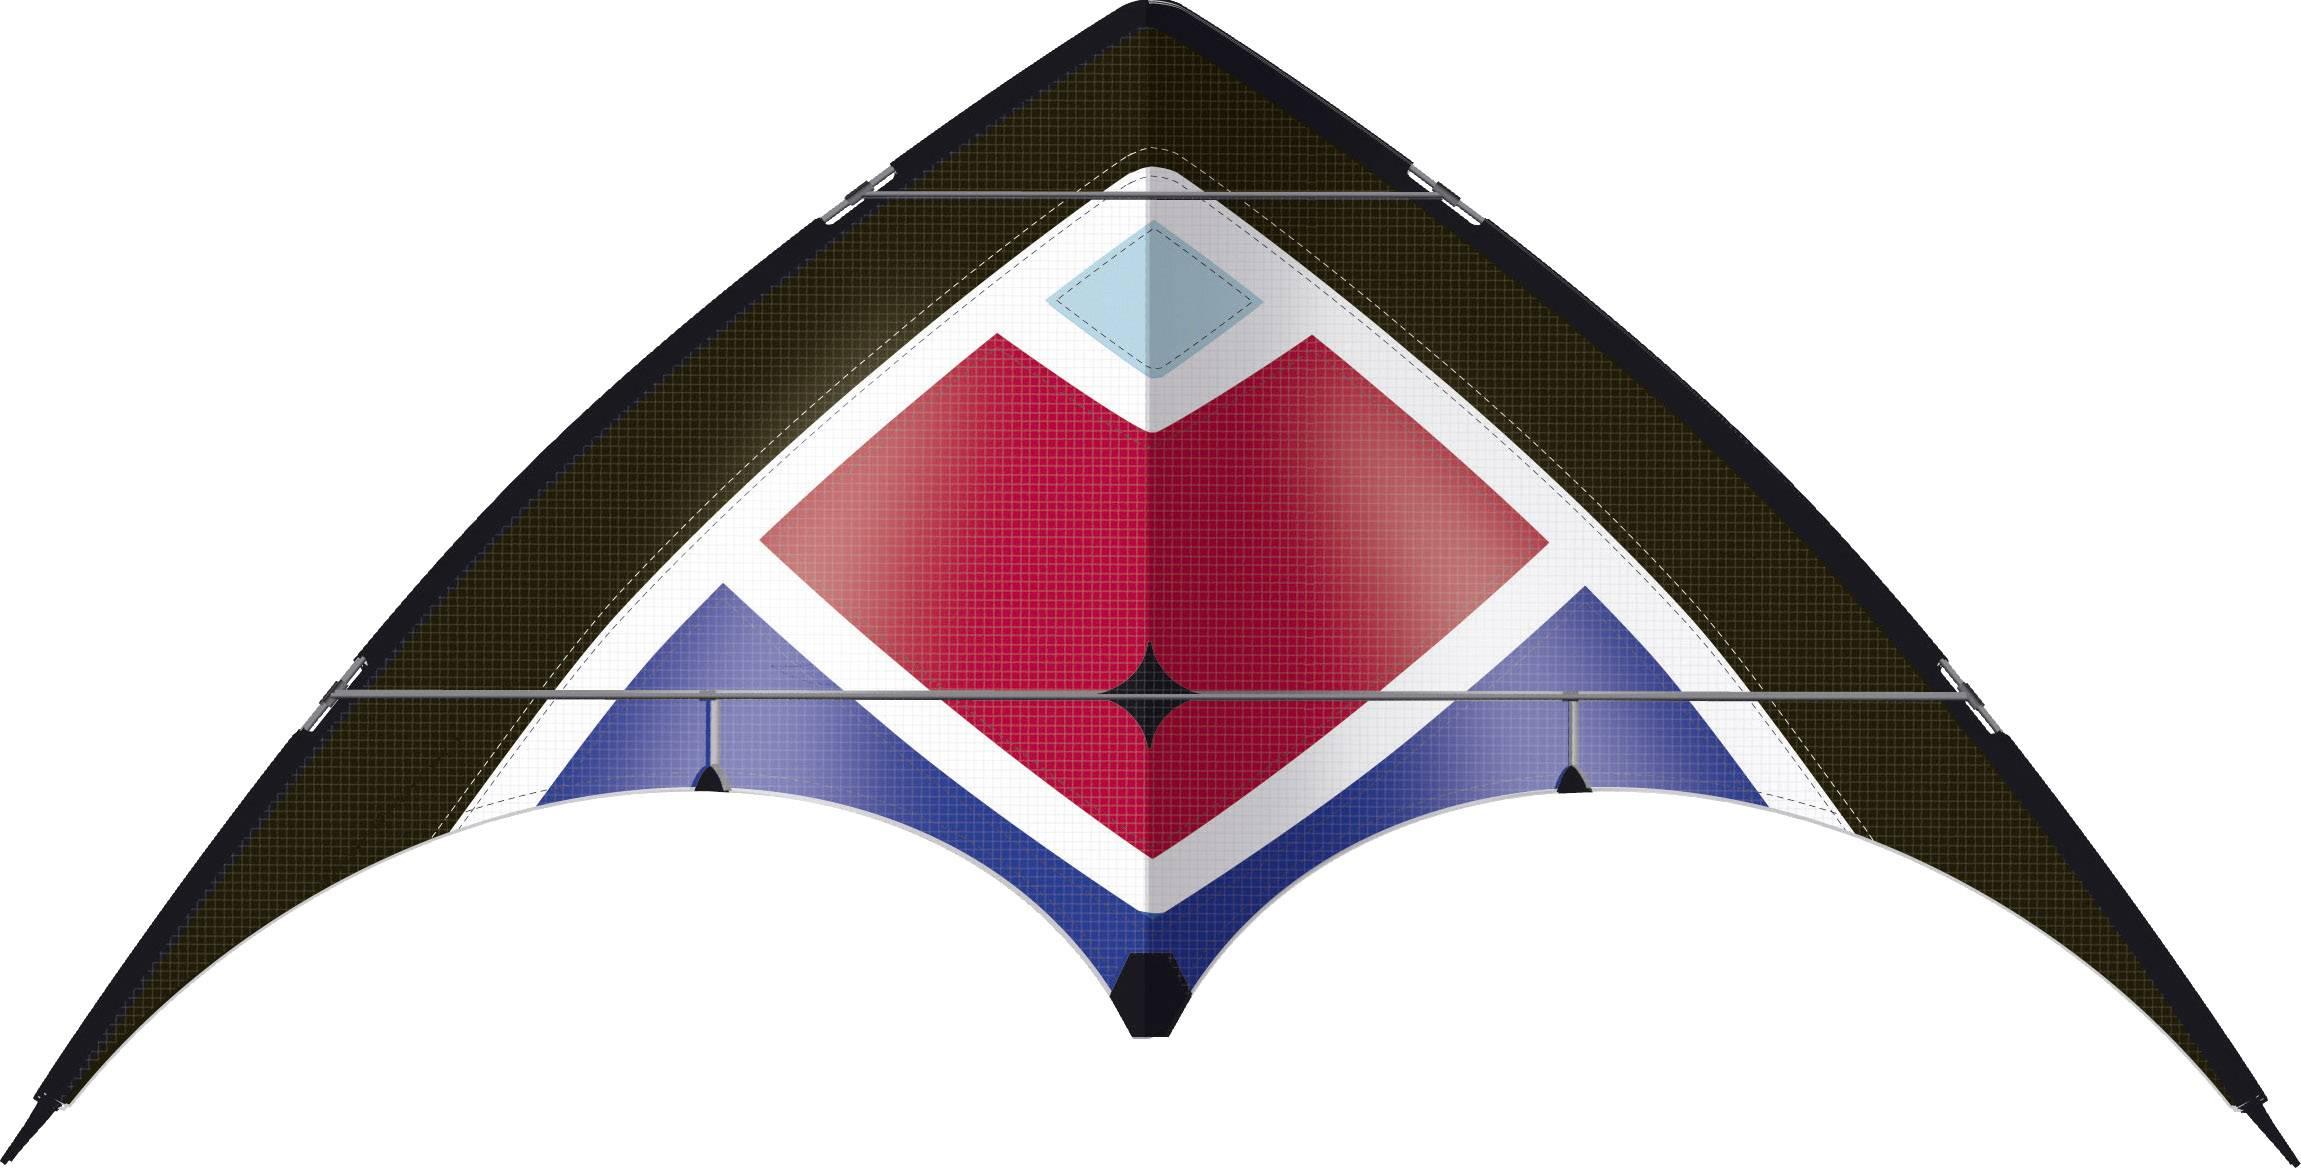 Športový šarkan Günther Flugspiele Sky Loop 1091, rozpätie 1600 mm